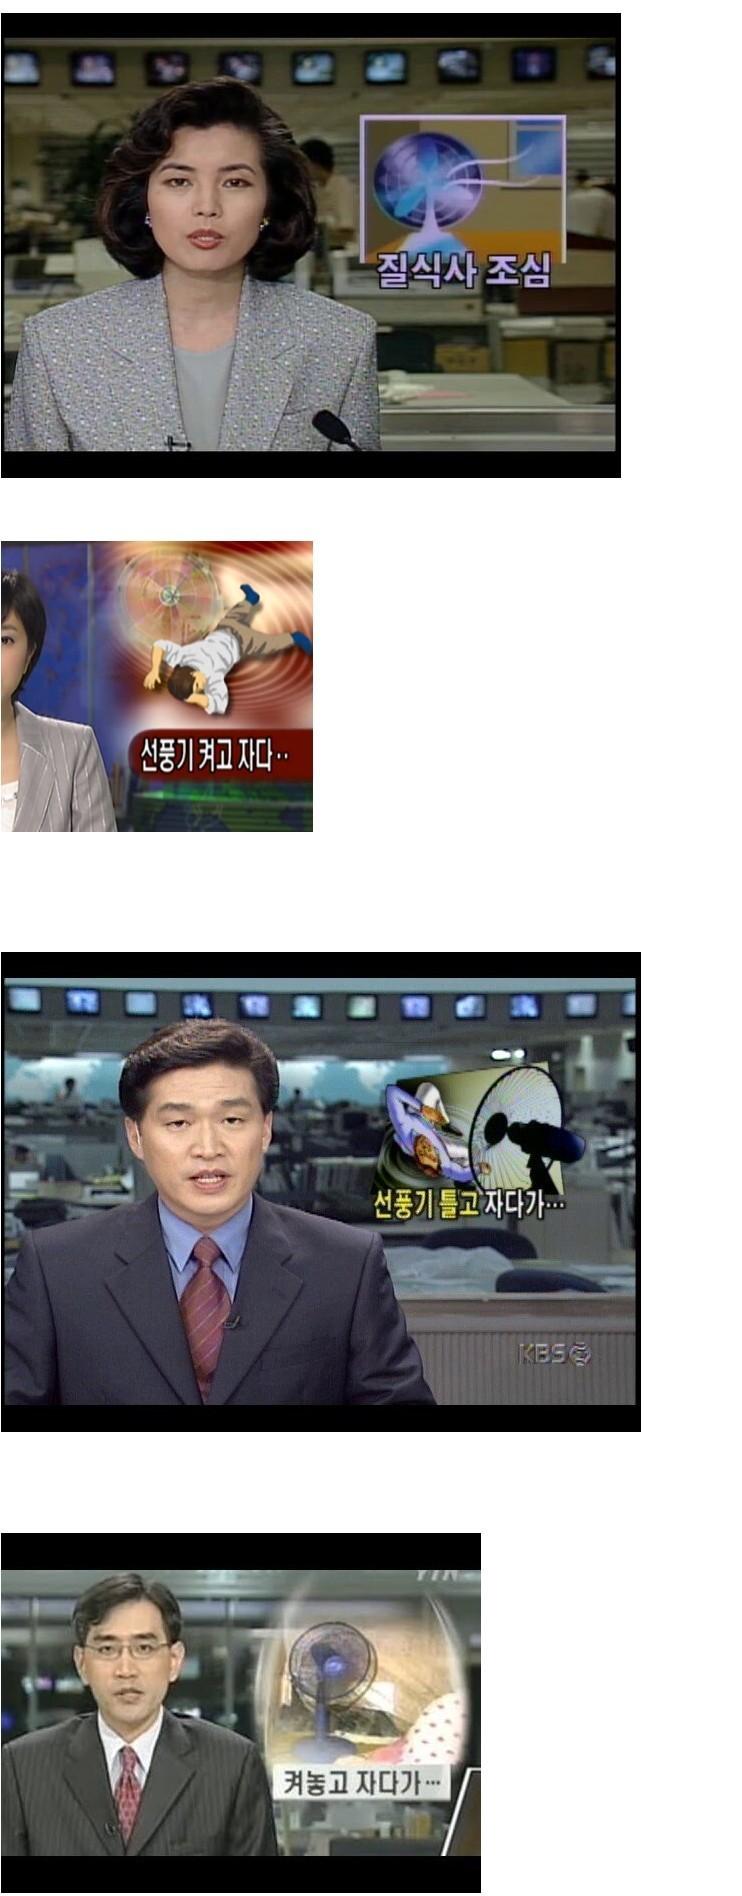 http://bbant-tv.com/data/editor/2007/15942691242756.jpg